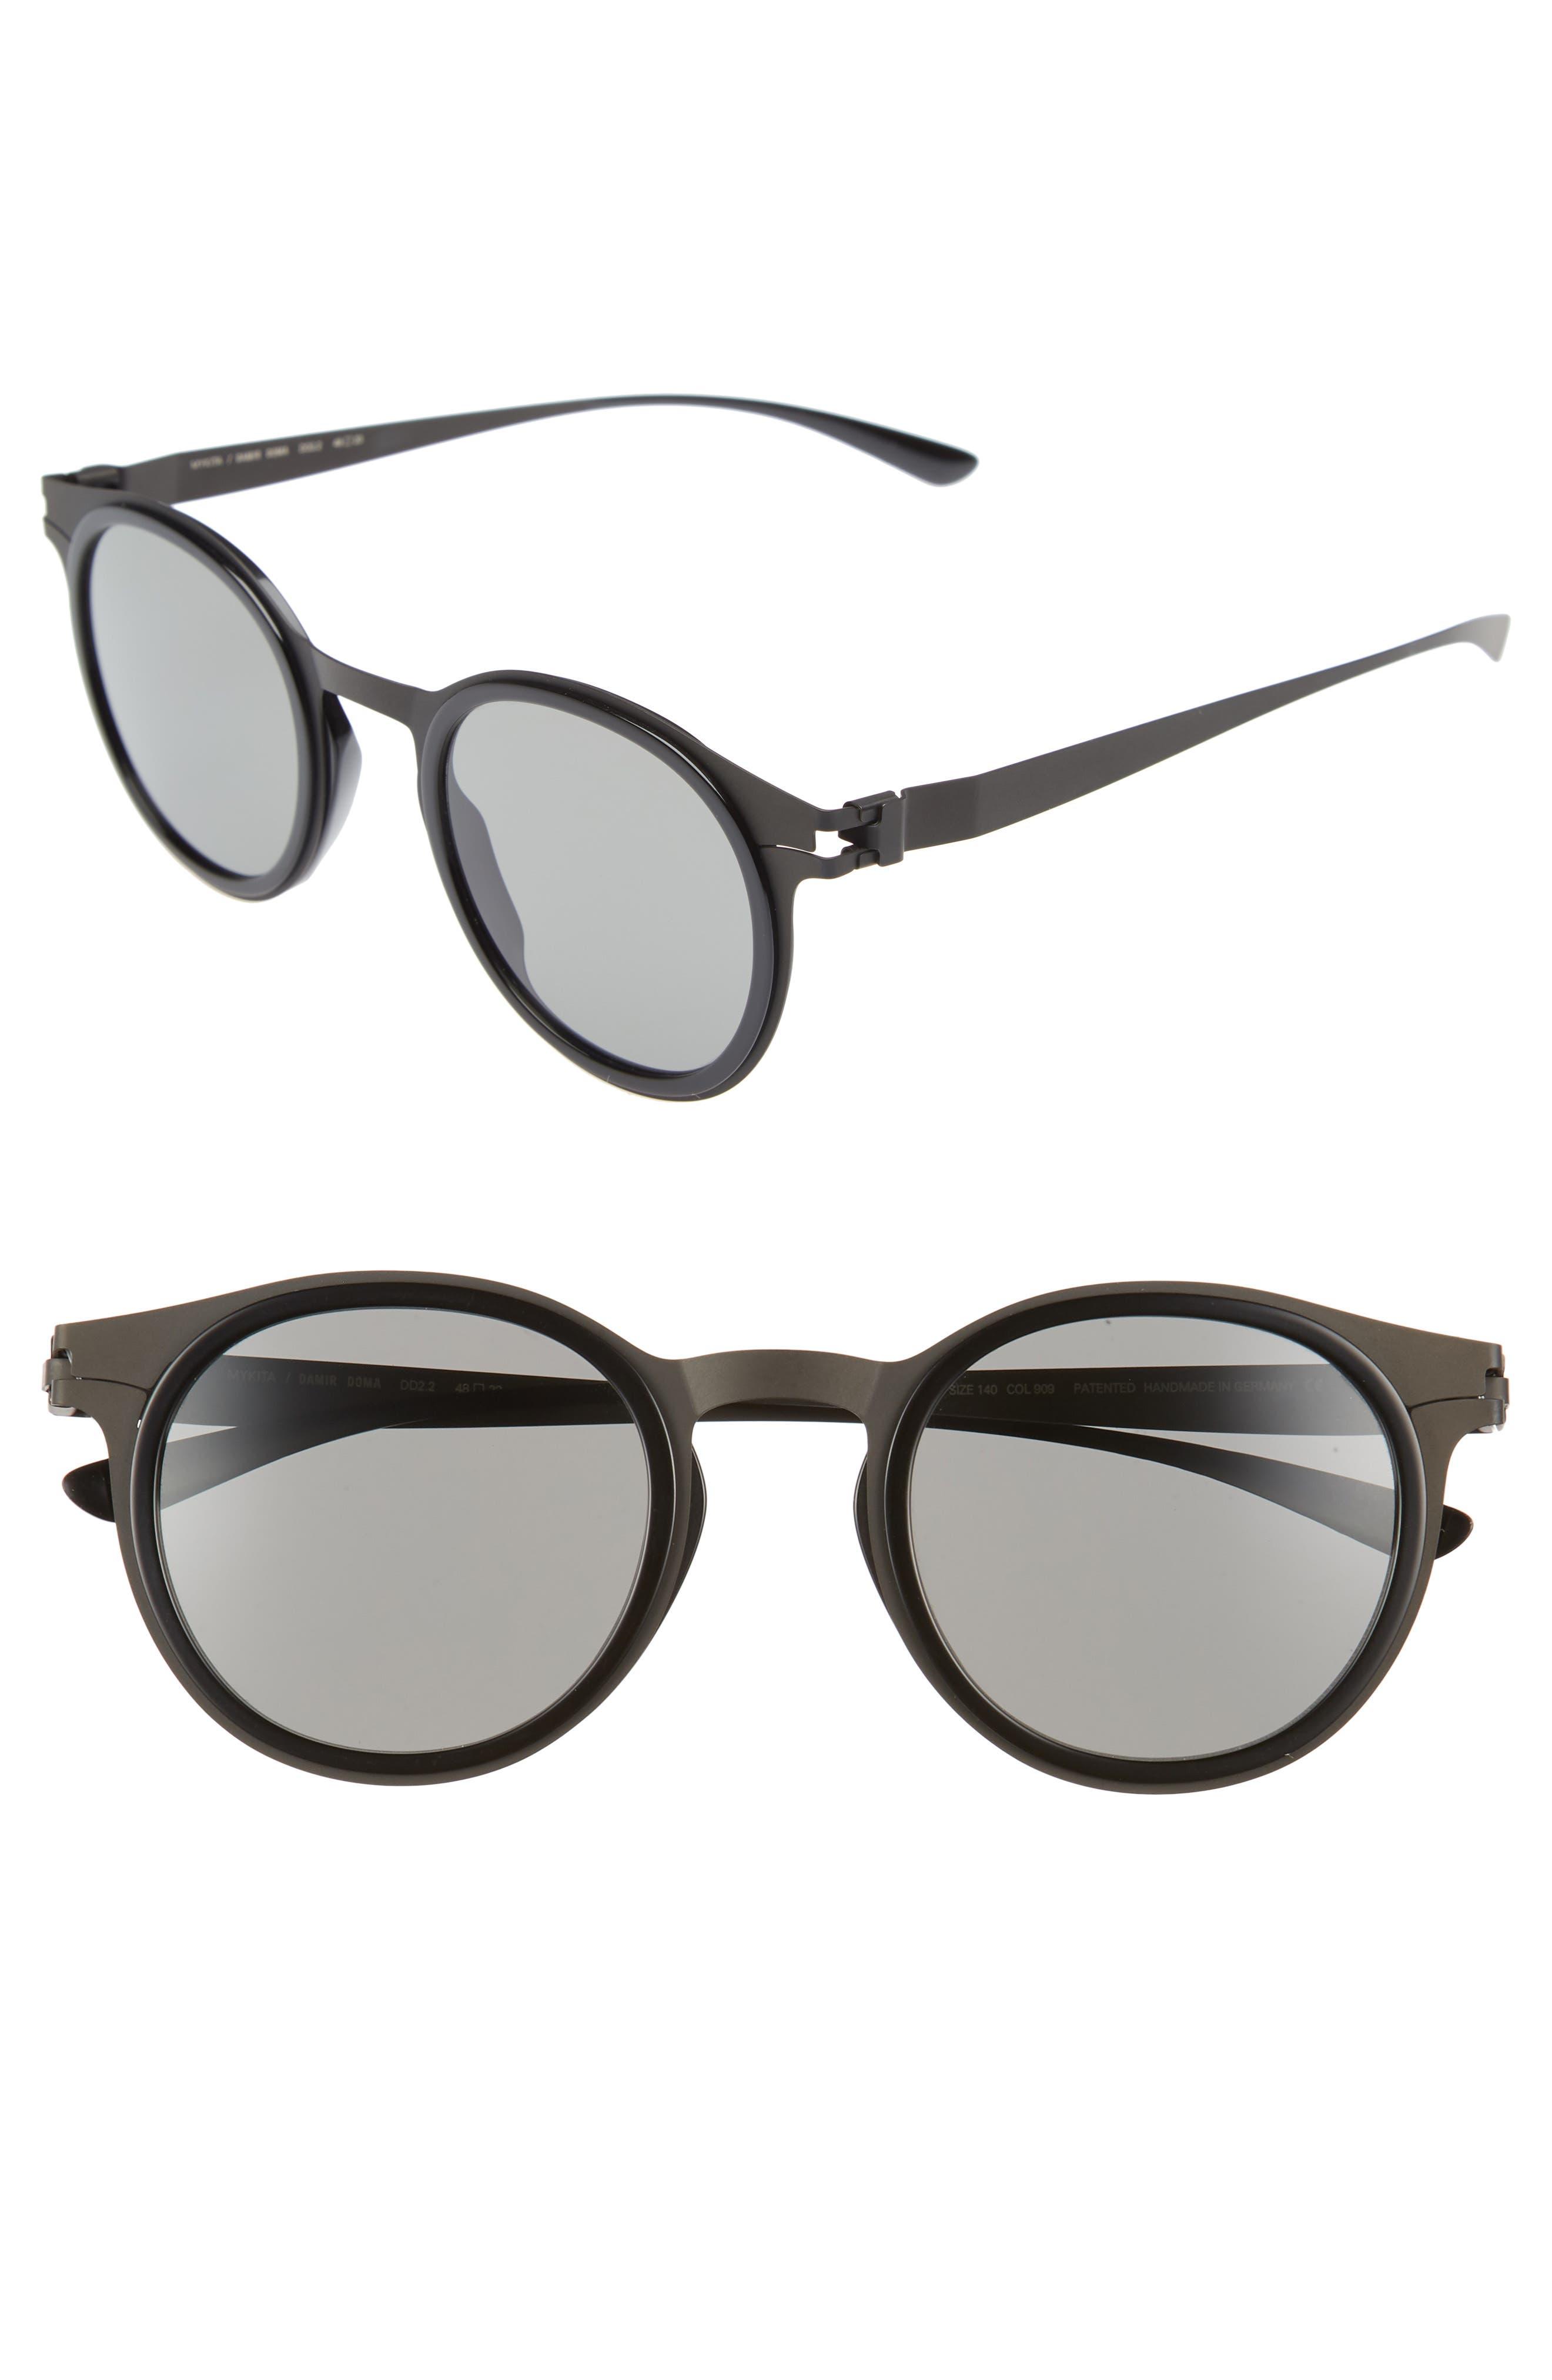 DD2.2 48mm Round Sunglasses,                             Main thumbnail 1, color,                             001